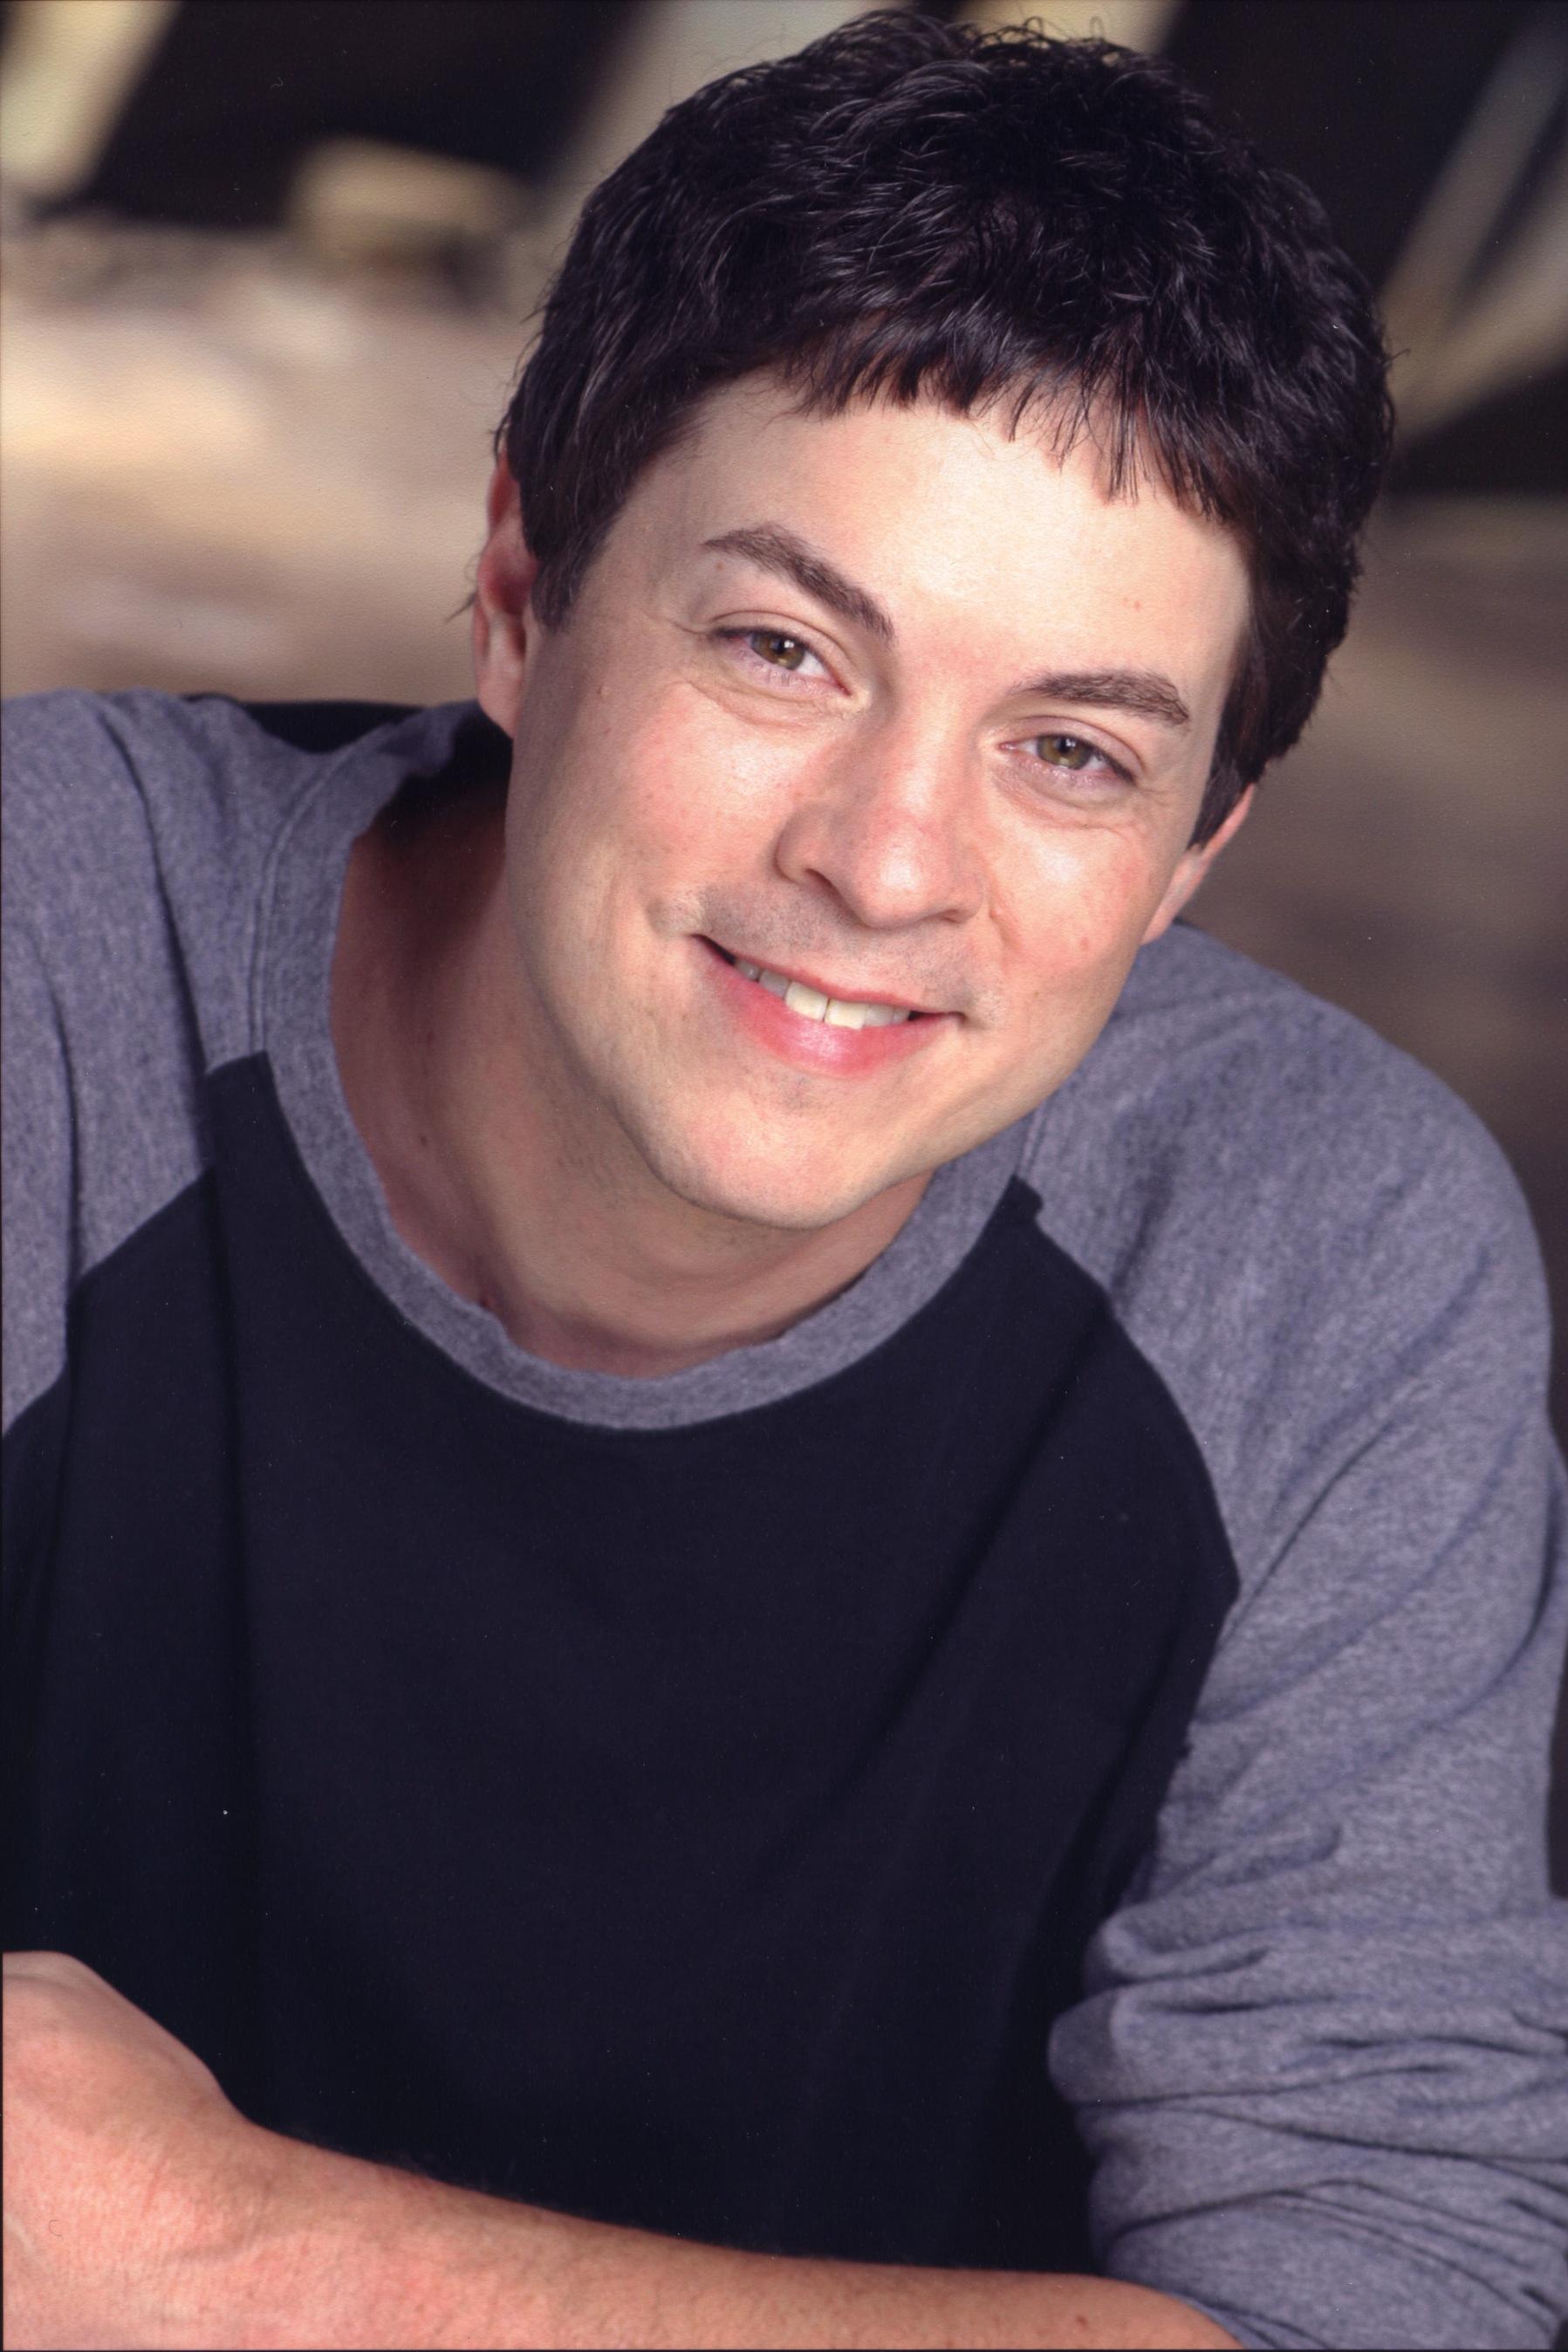 David Mauk